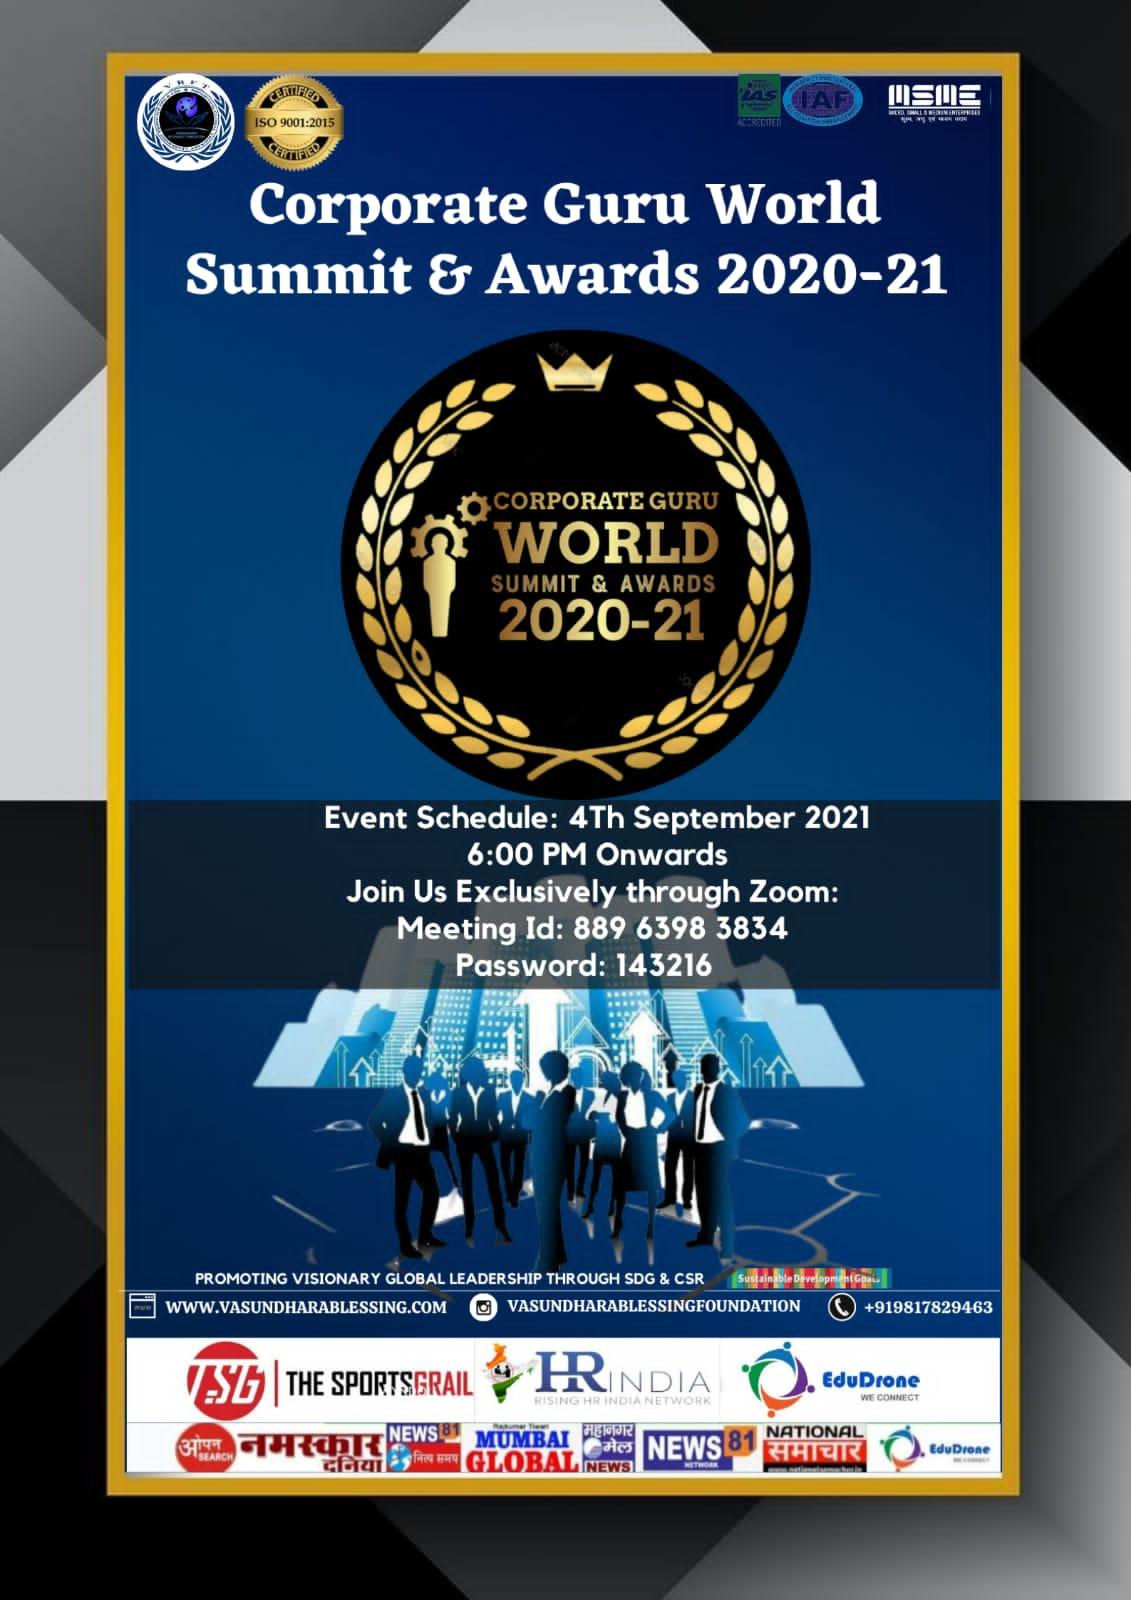 Corporate Guru World Summit And Awards 2021, 4th September